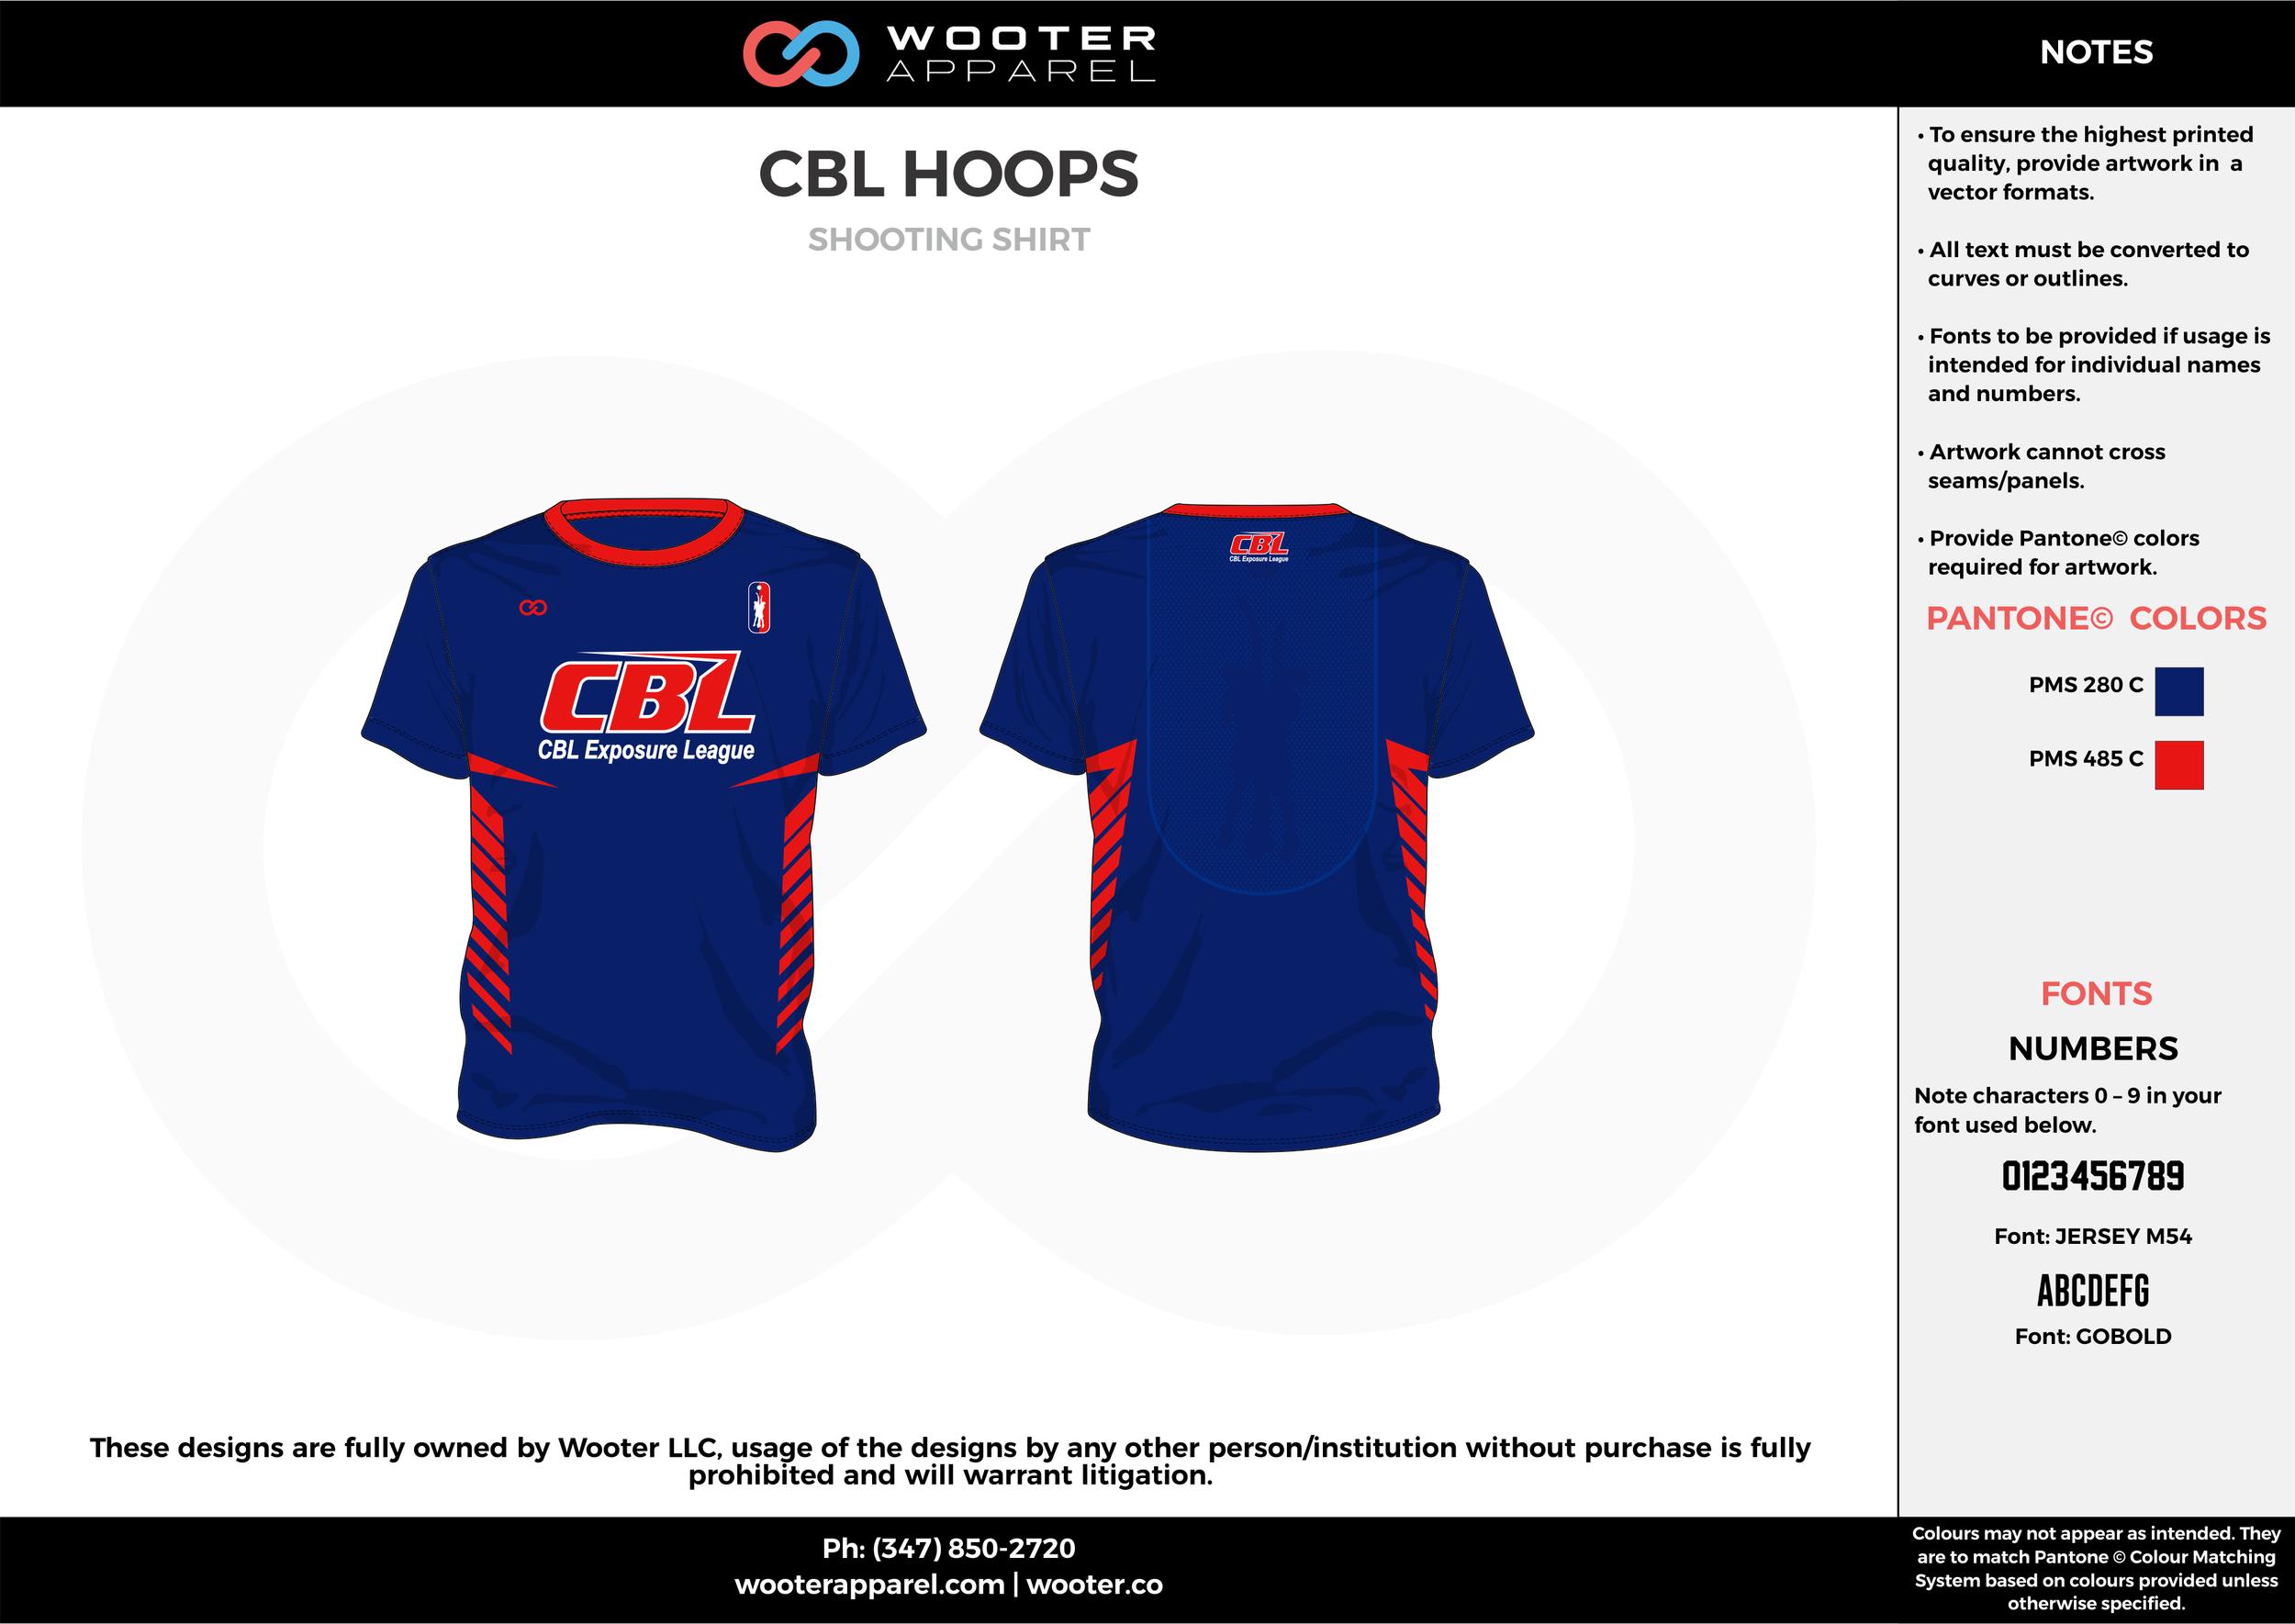 CBL HOOPS blue red Basketball Short Sleeve Shooting Shirt